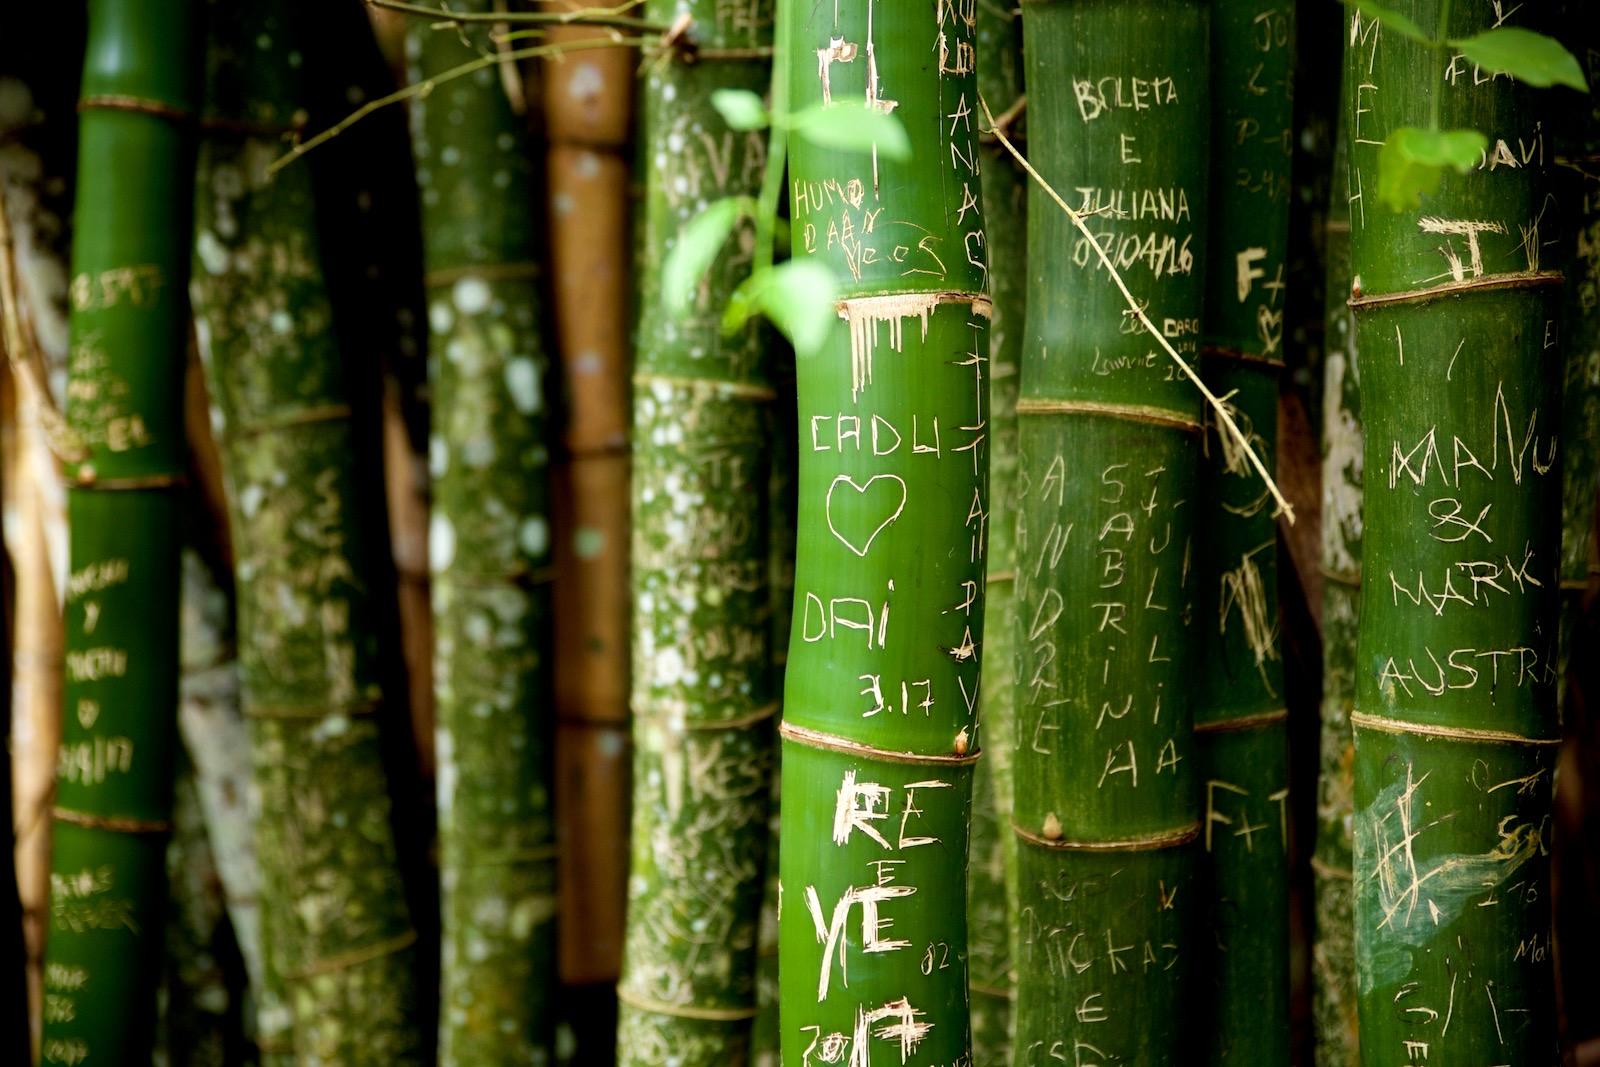 Store bambus på Ilha Grande